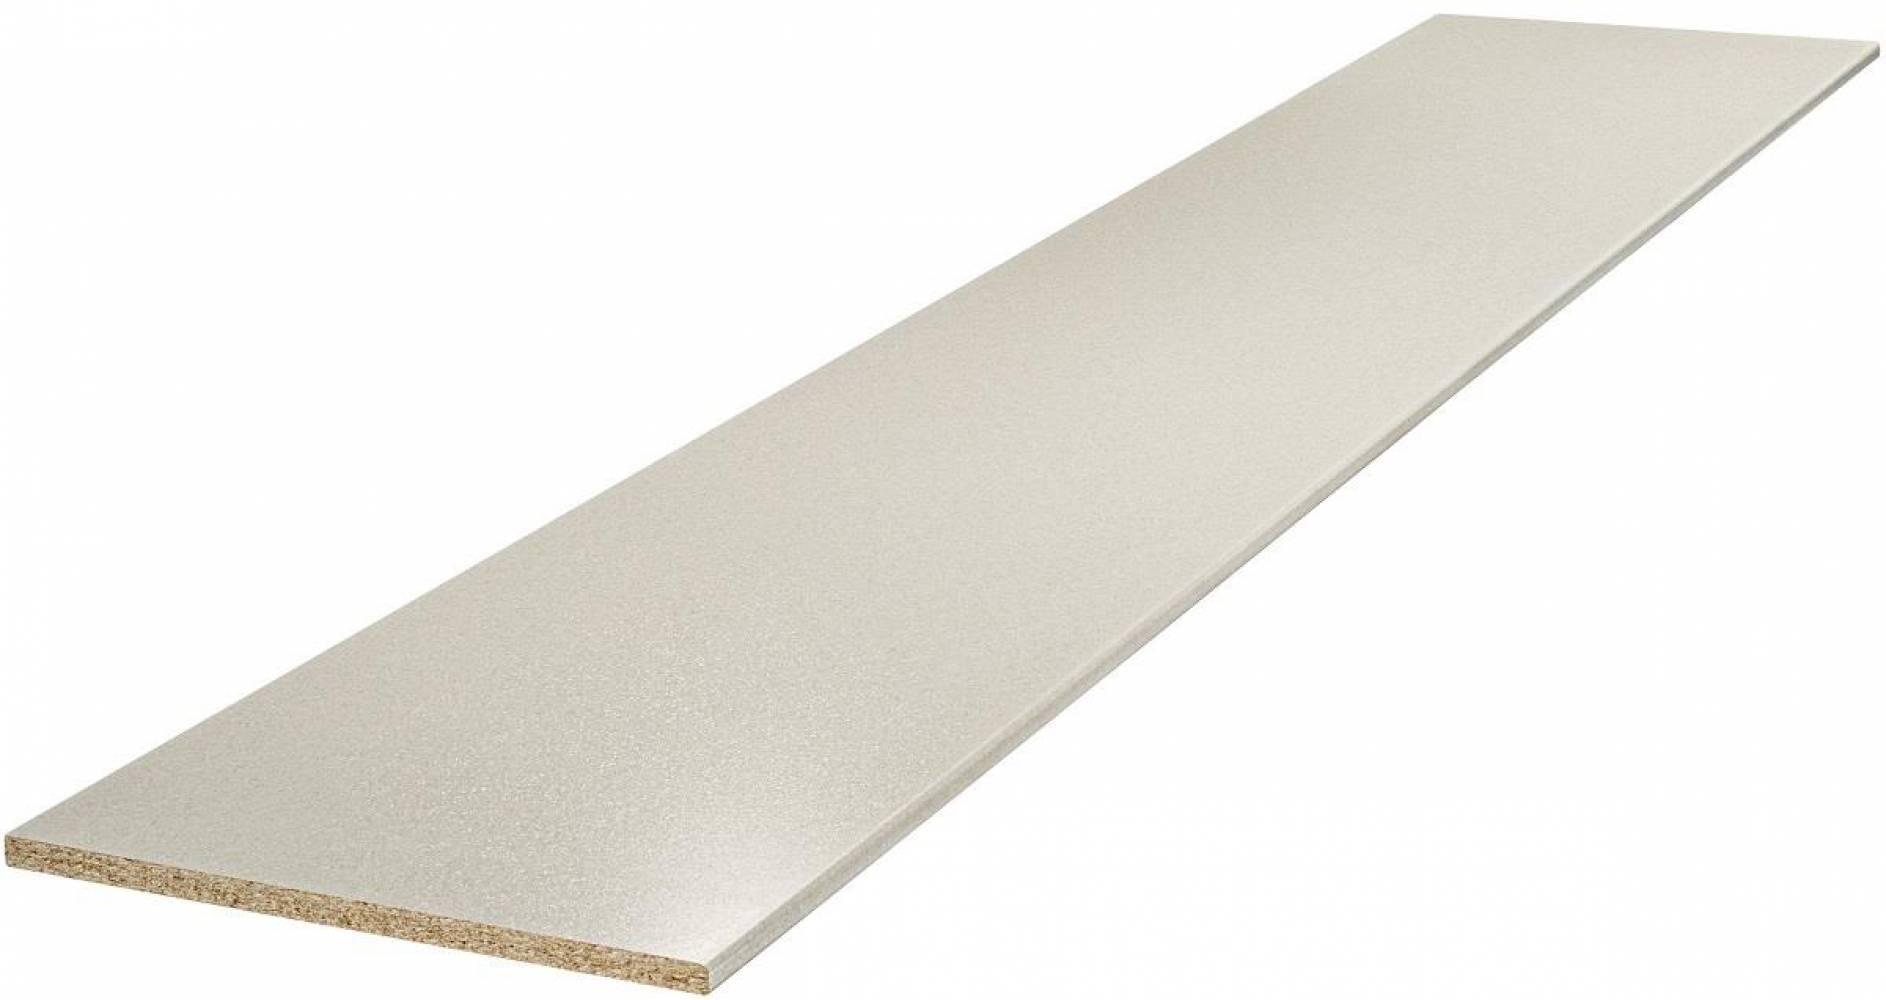 Столешница № 400 Б Бриллиант белый 26 мм Матовая Скиф, цена  за пог/метр